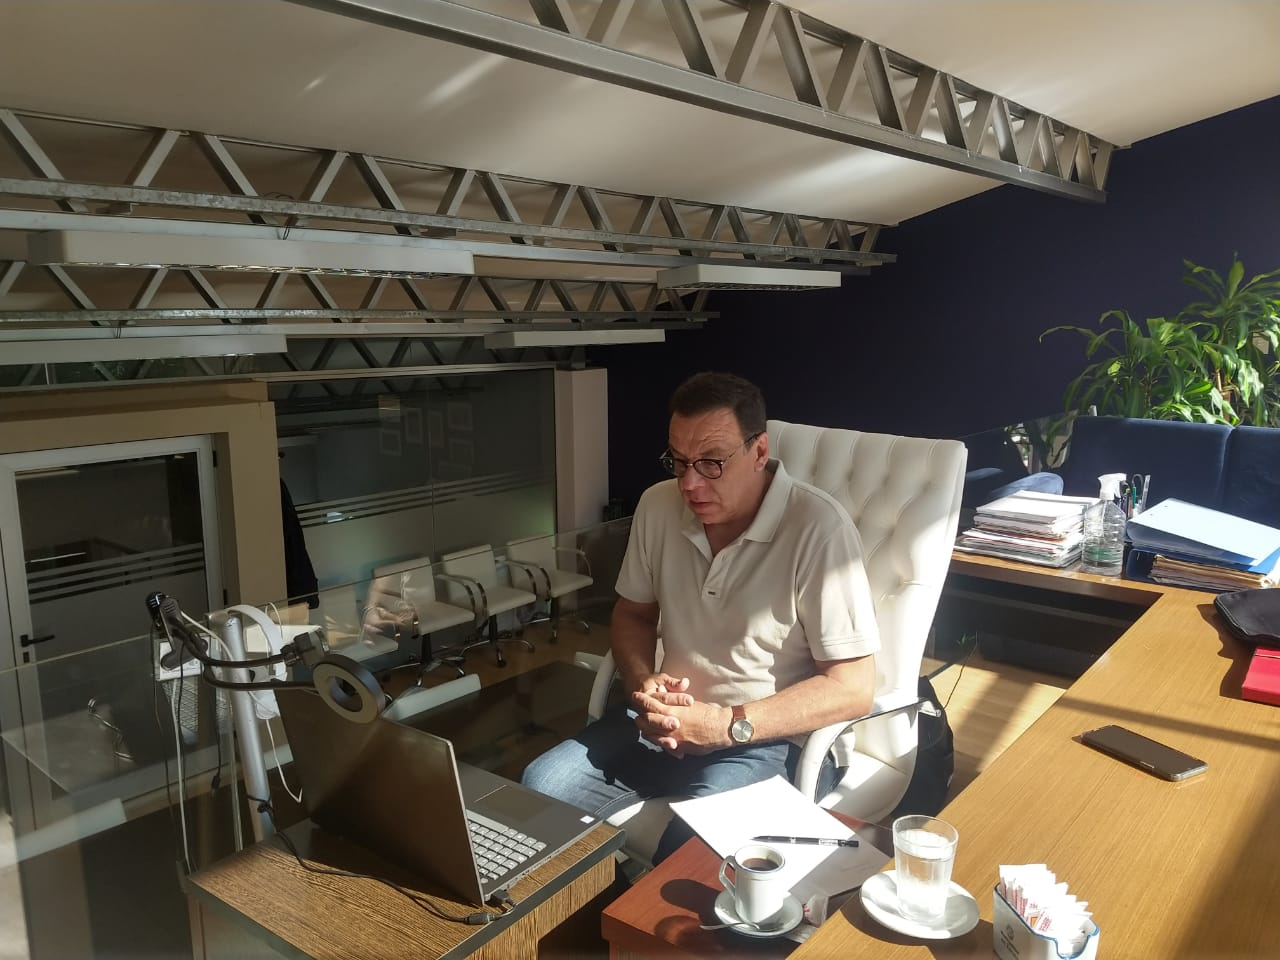 Situación Epidemiológica: Cáffaro participó de una nueva reunión virtual con el gobernador bonaerense Axel Kicillof e intendentes del AMBA